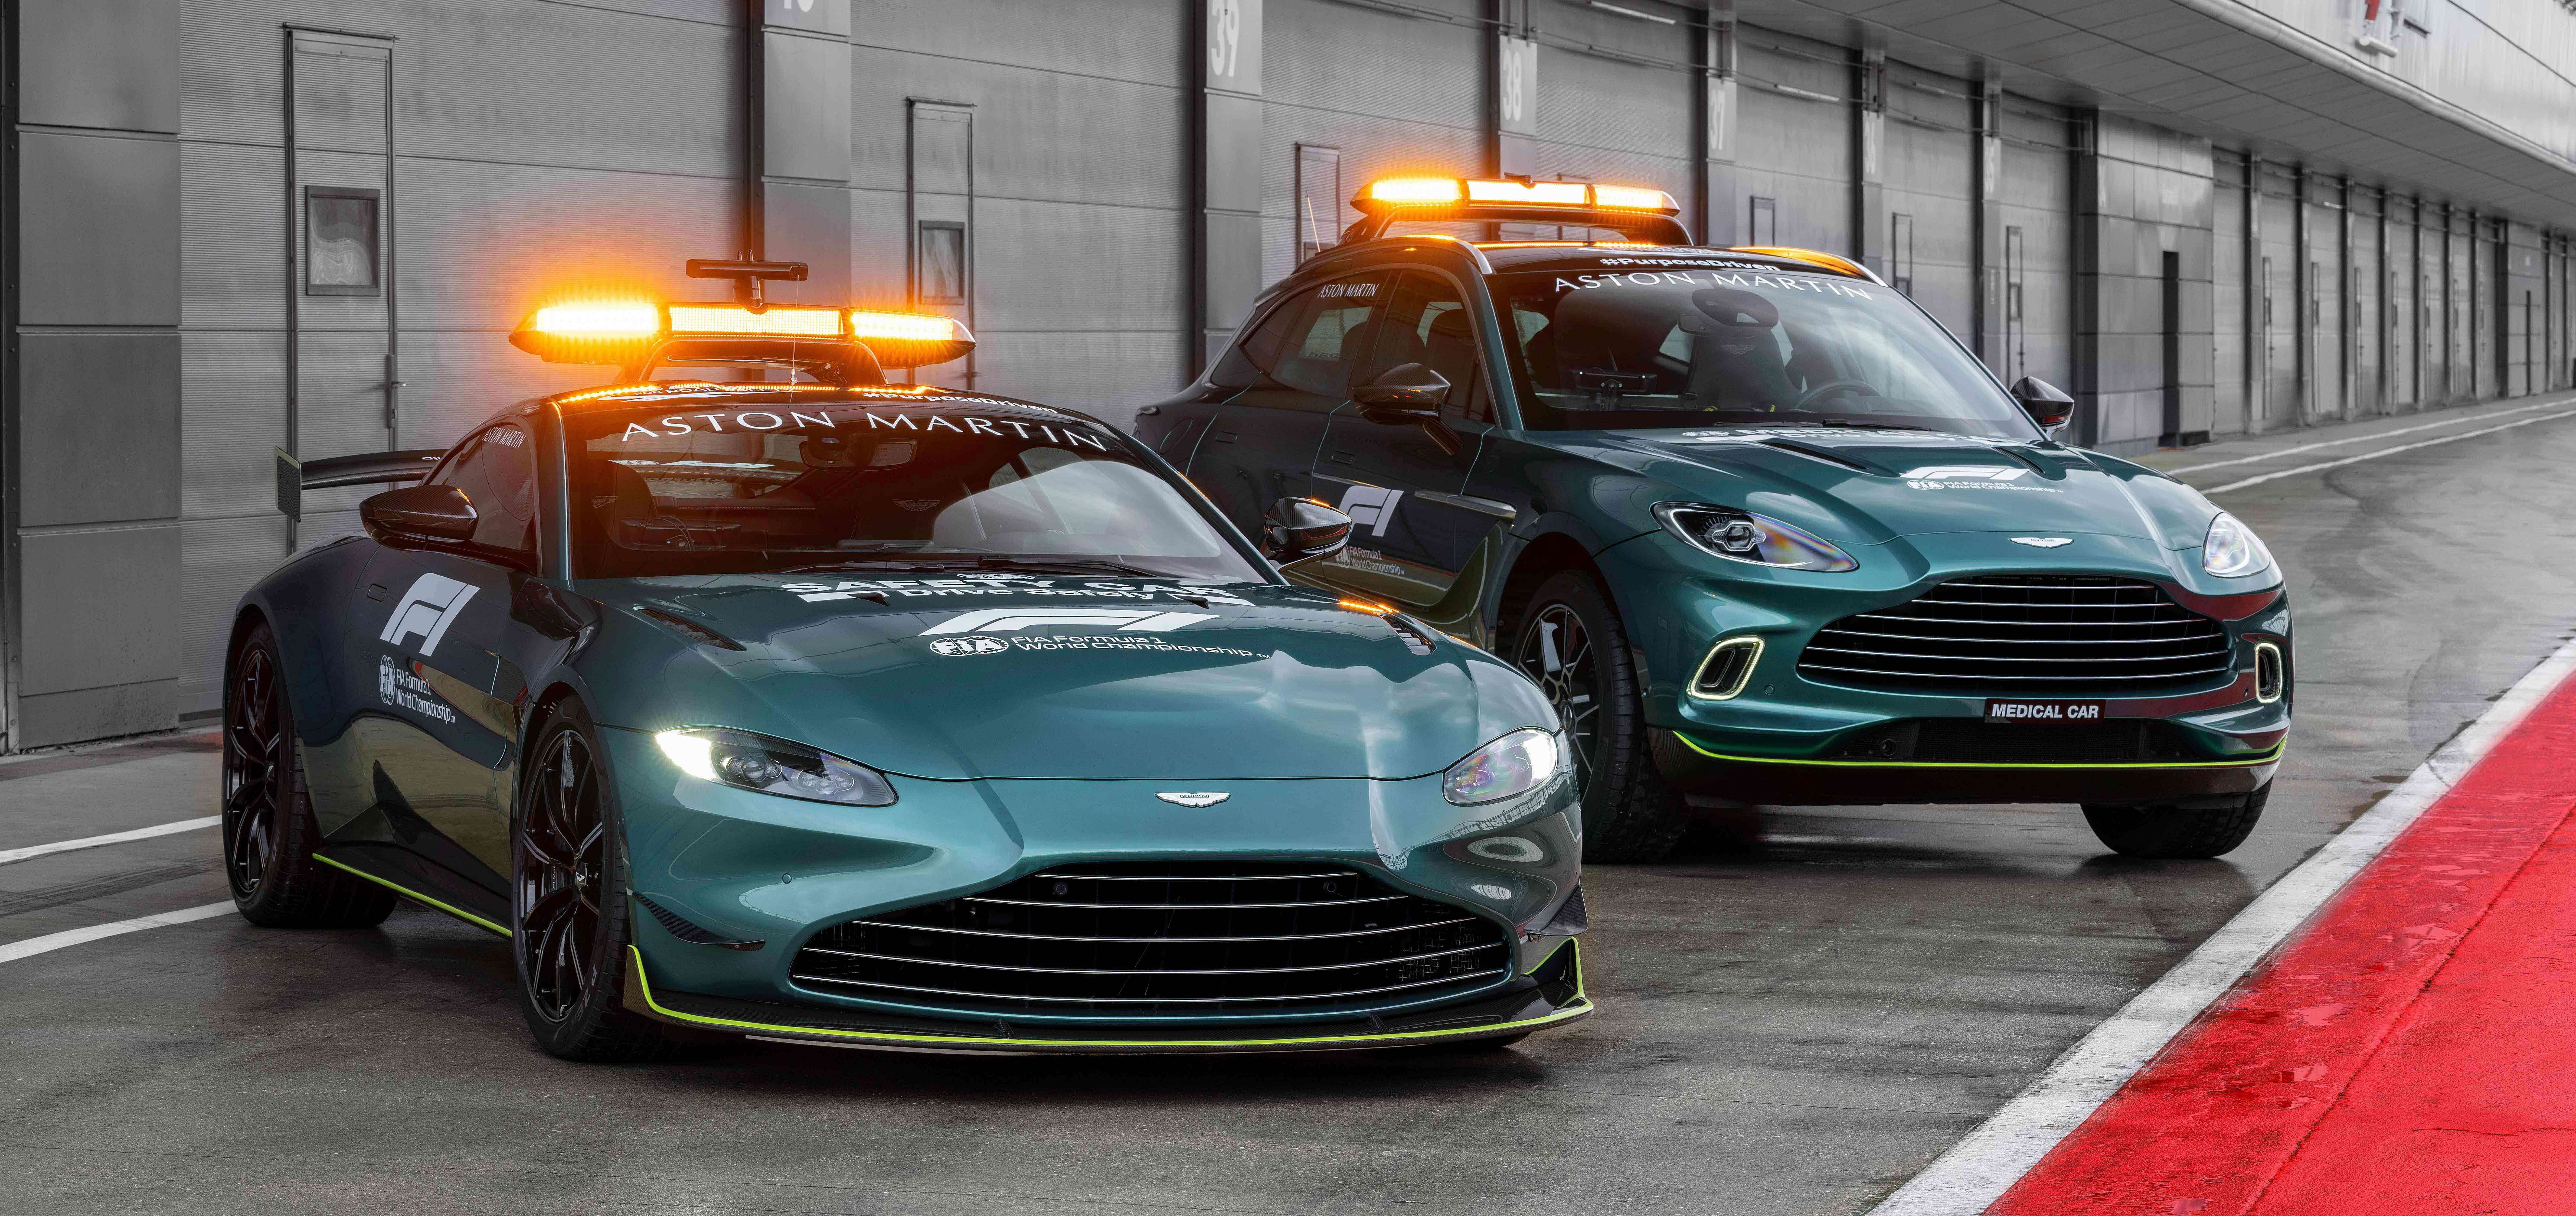 Aston Martin takes pole position as an  Official Safety Car of Formula 1